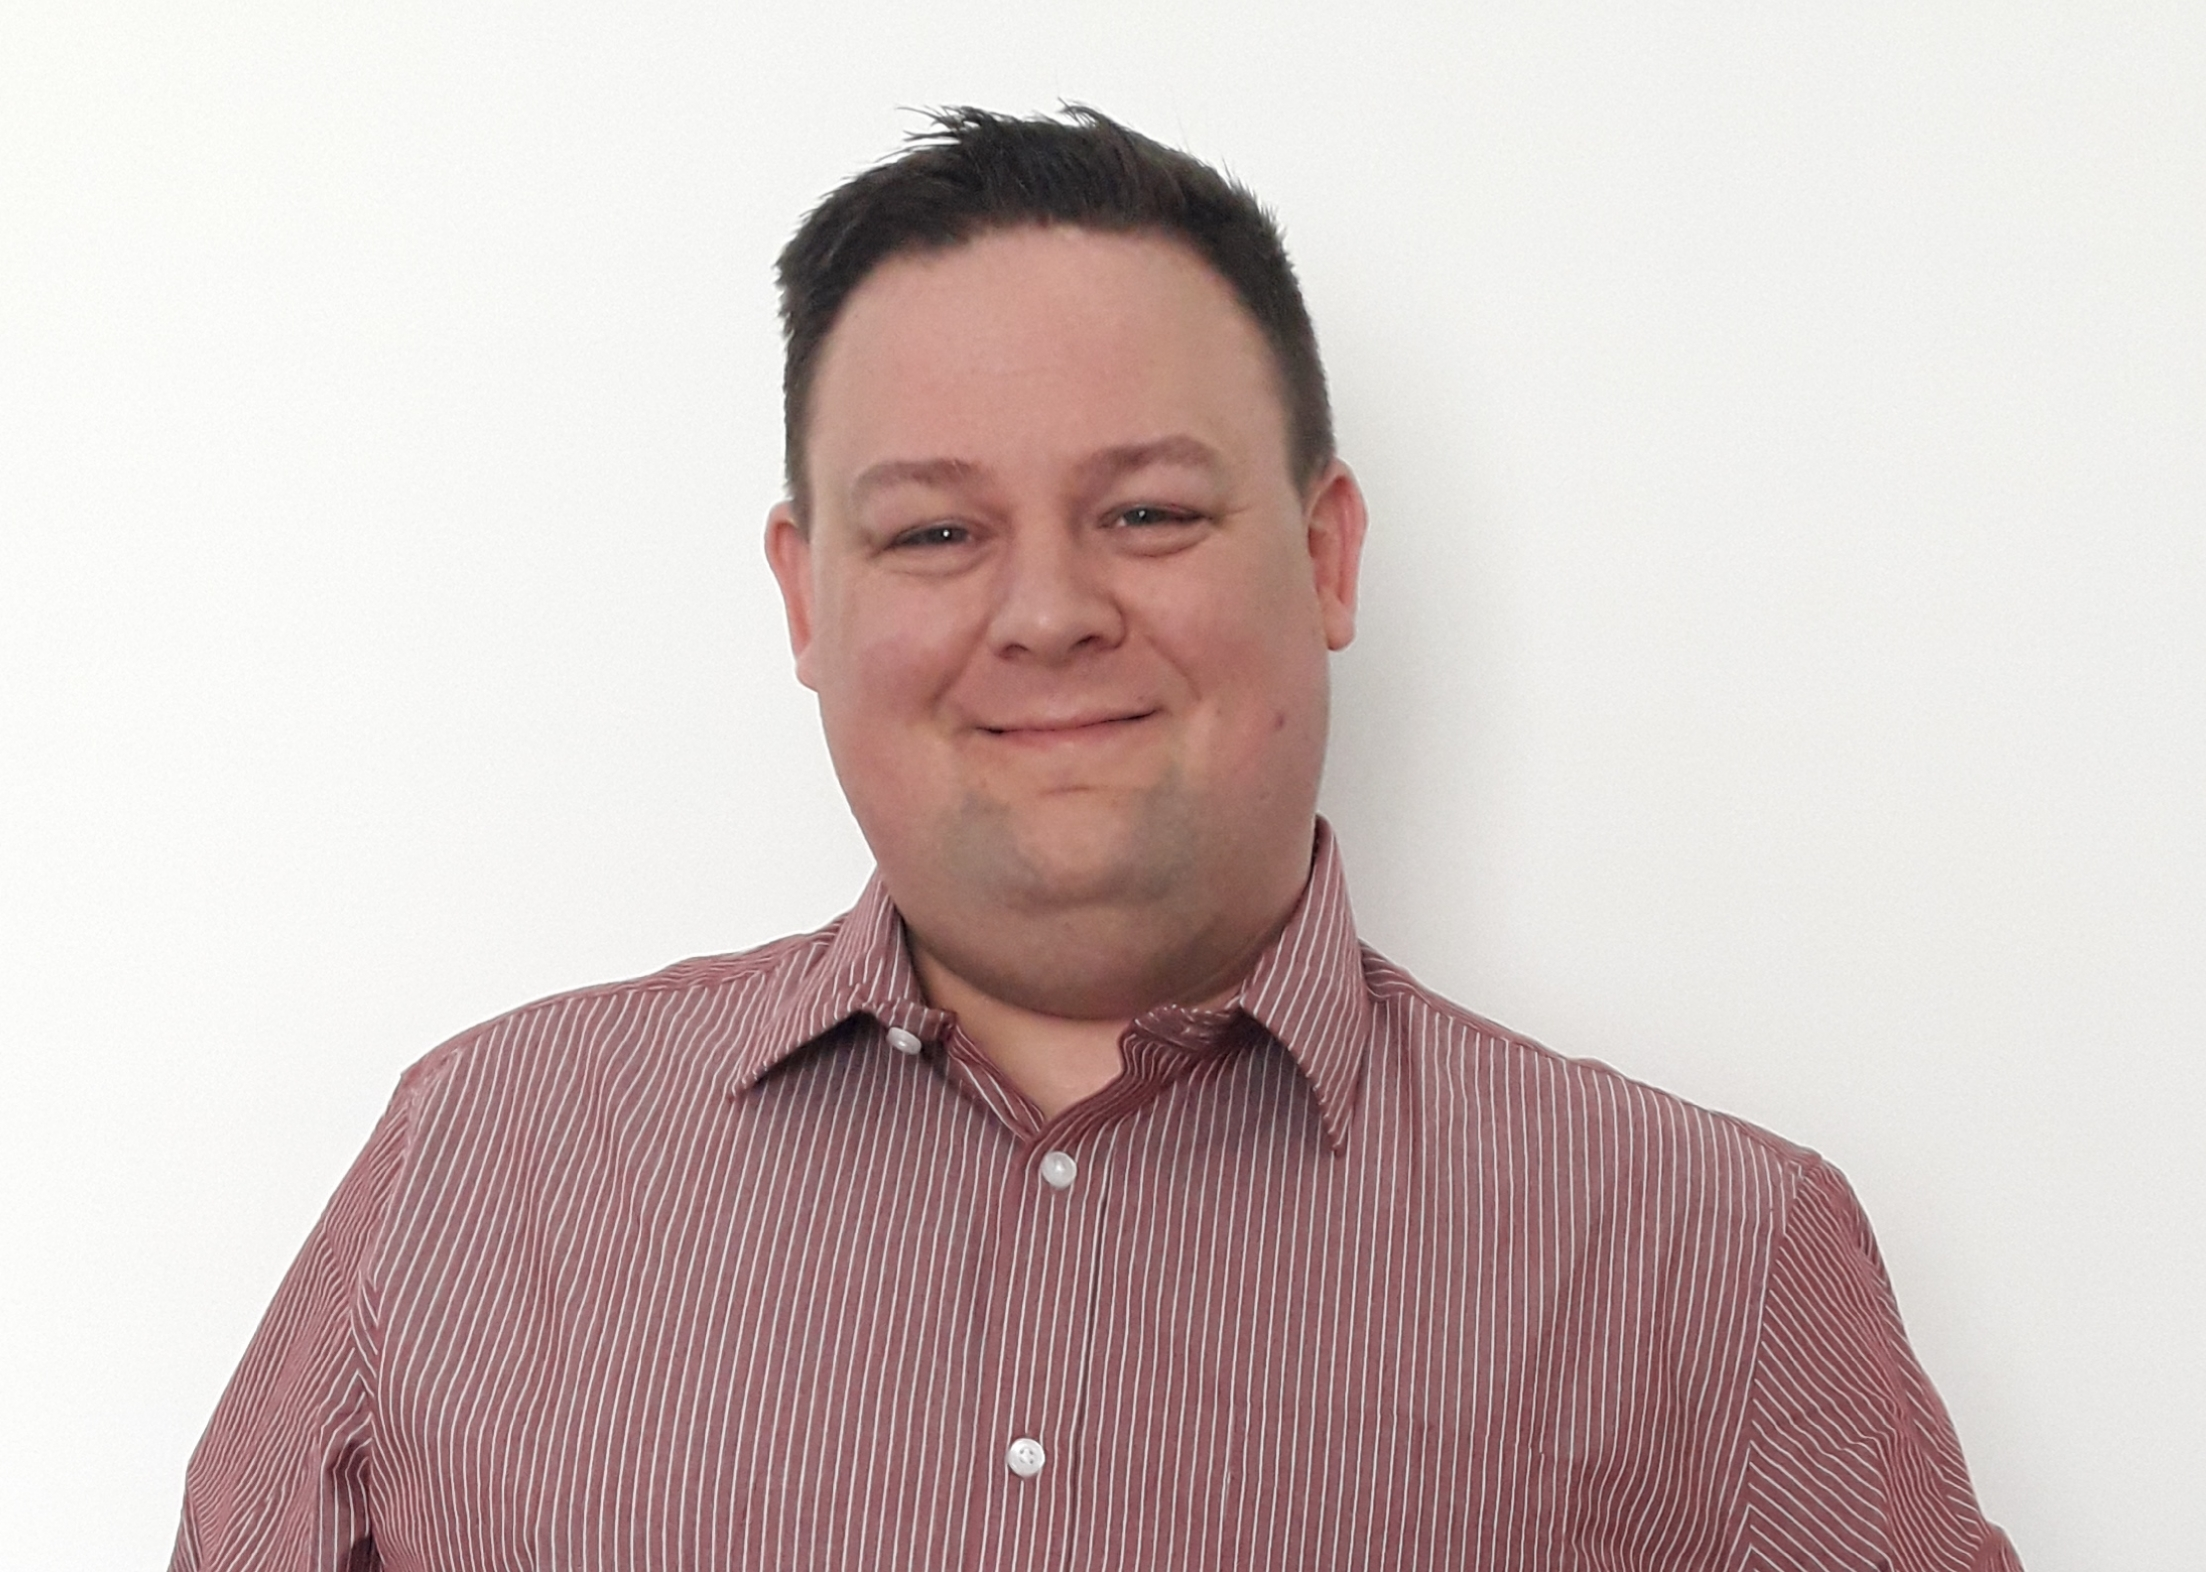 Darrell Jones leads operations at Flavourfresh